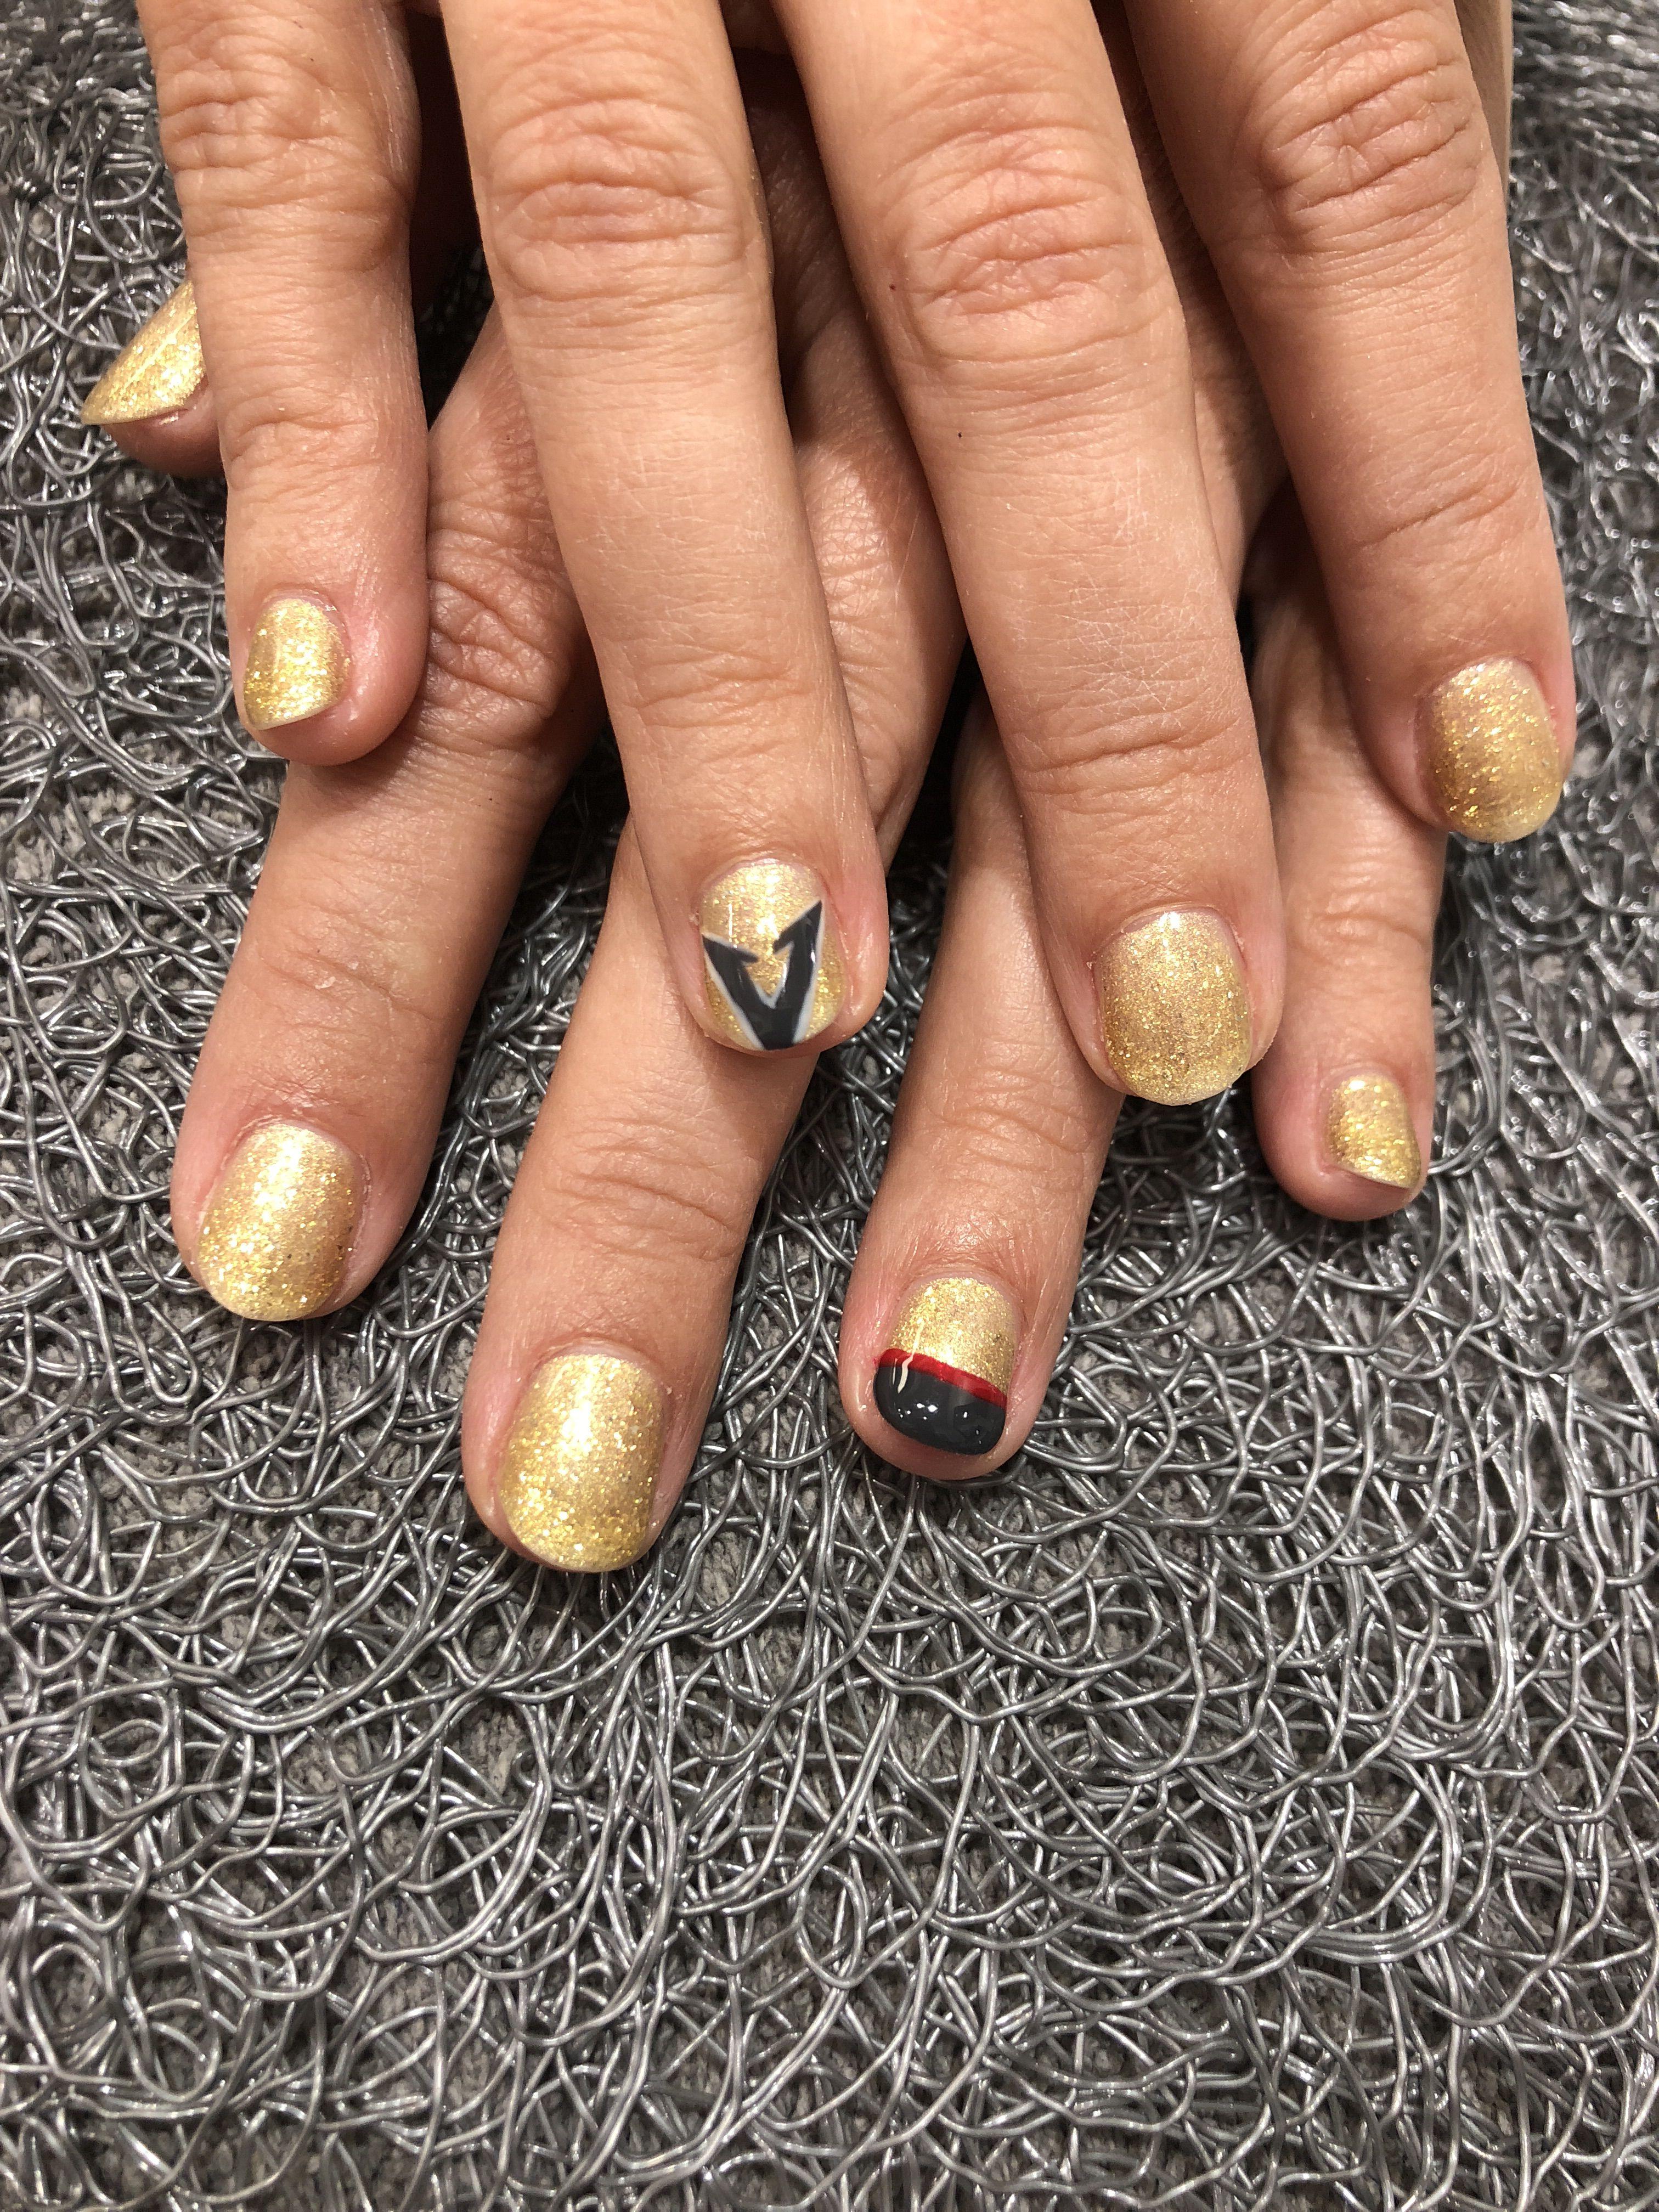 Gel manicure Las Vegas Golden Knights nail art | nail art | Pinterest